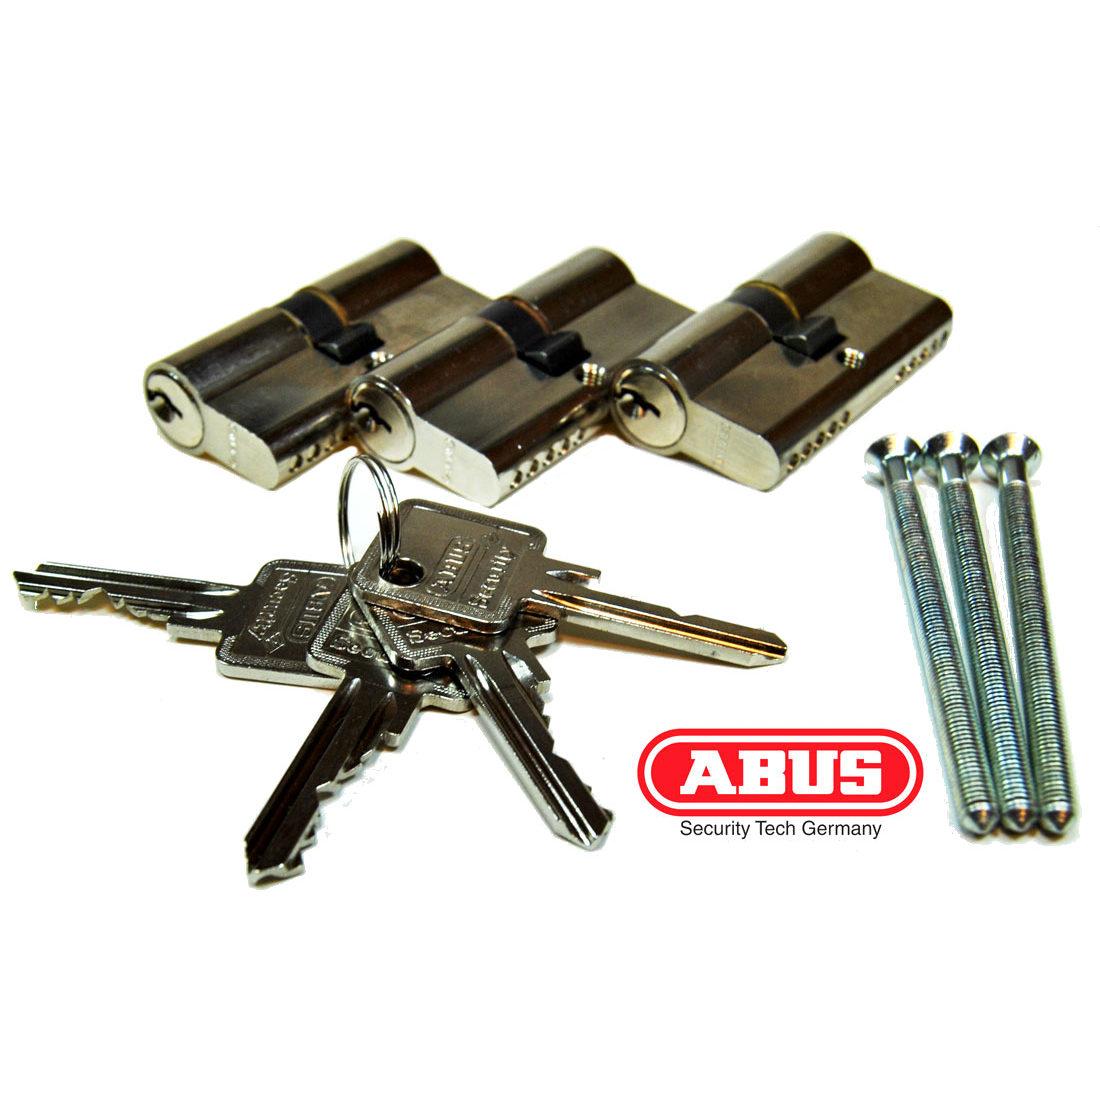 ABUS Türzylinder-Set inkl. 4x Schlüssel